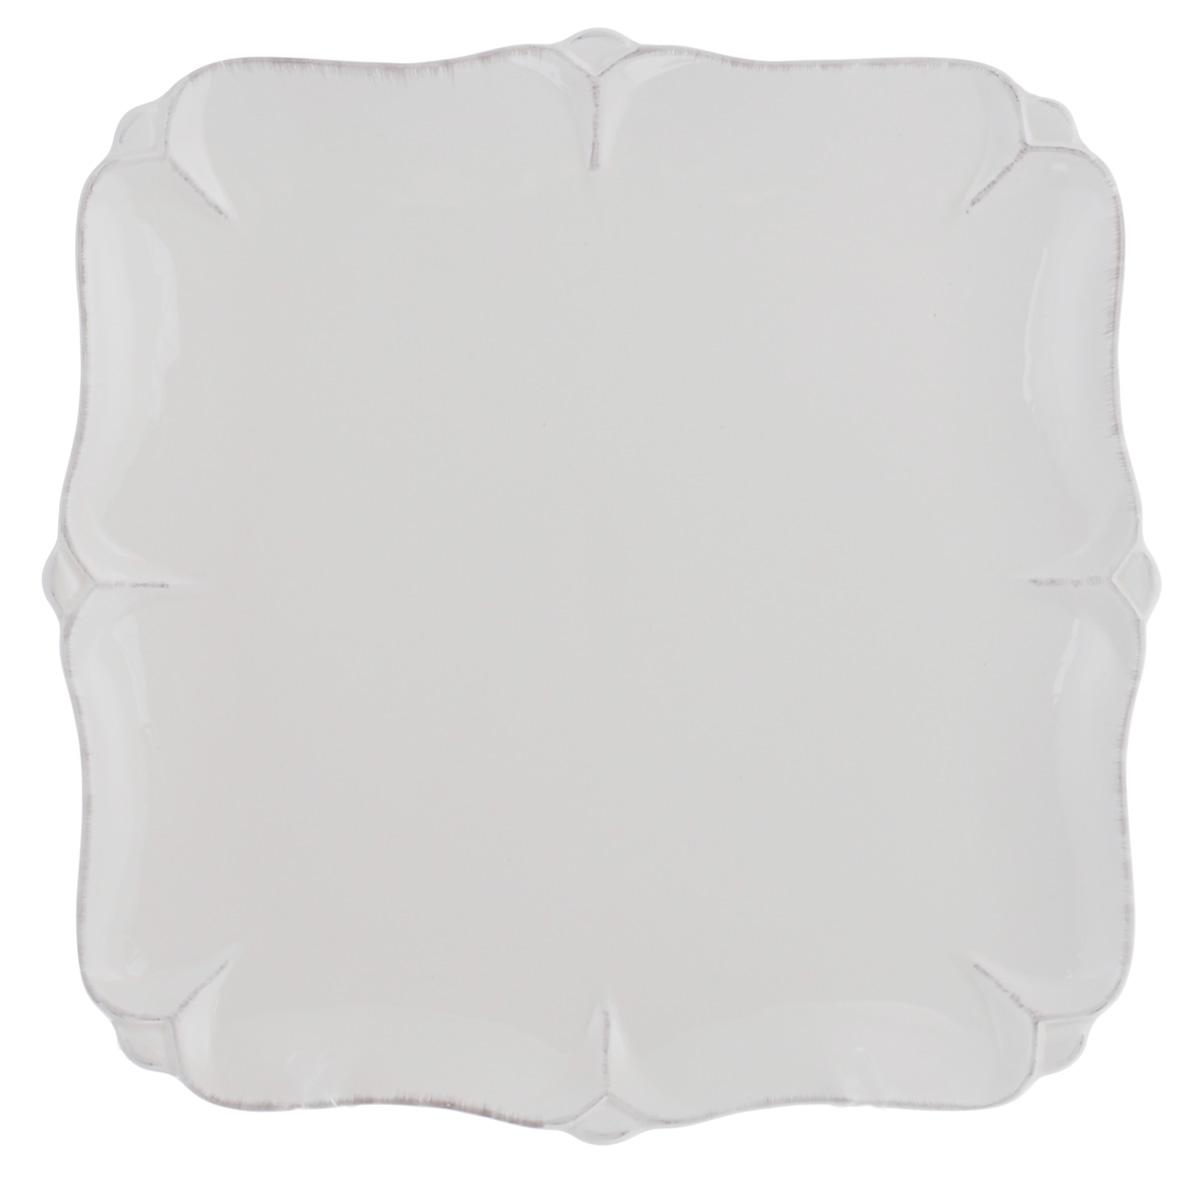 Тарелка Lillo Ideal, цвет: молочный, 25 см х 25 см тарелка под пасту 25 5 см royal porcelain тарелка под пасту 25 5 см